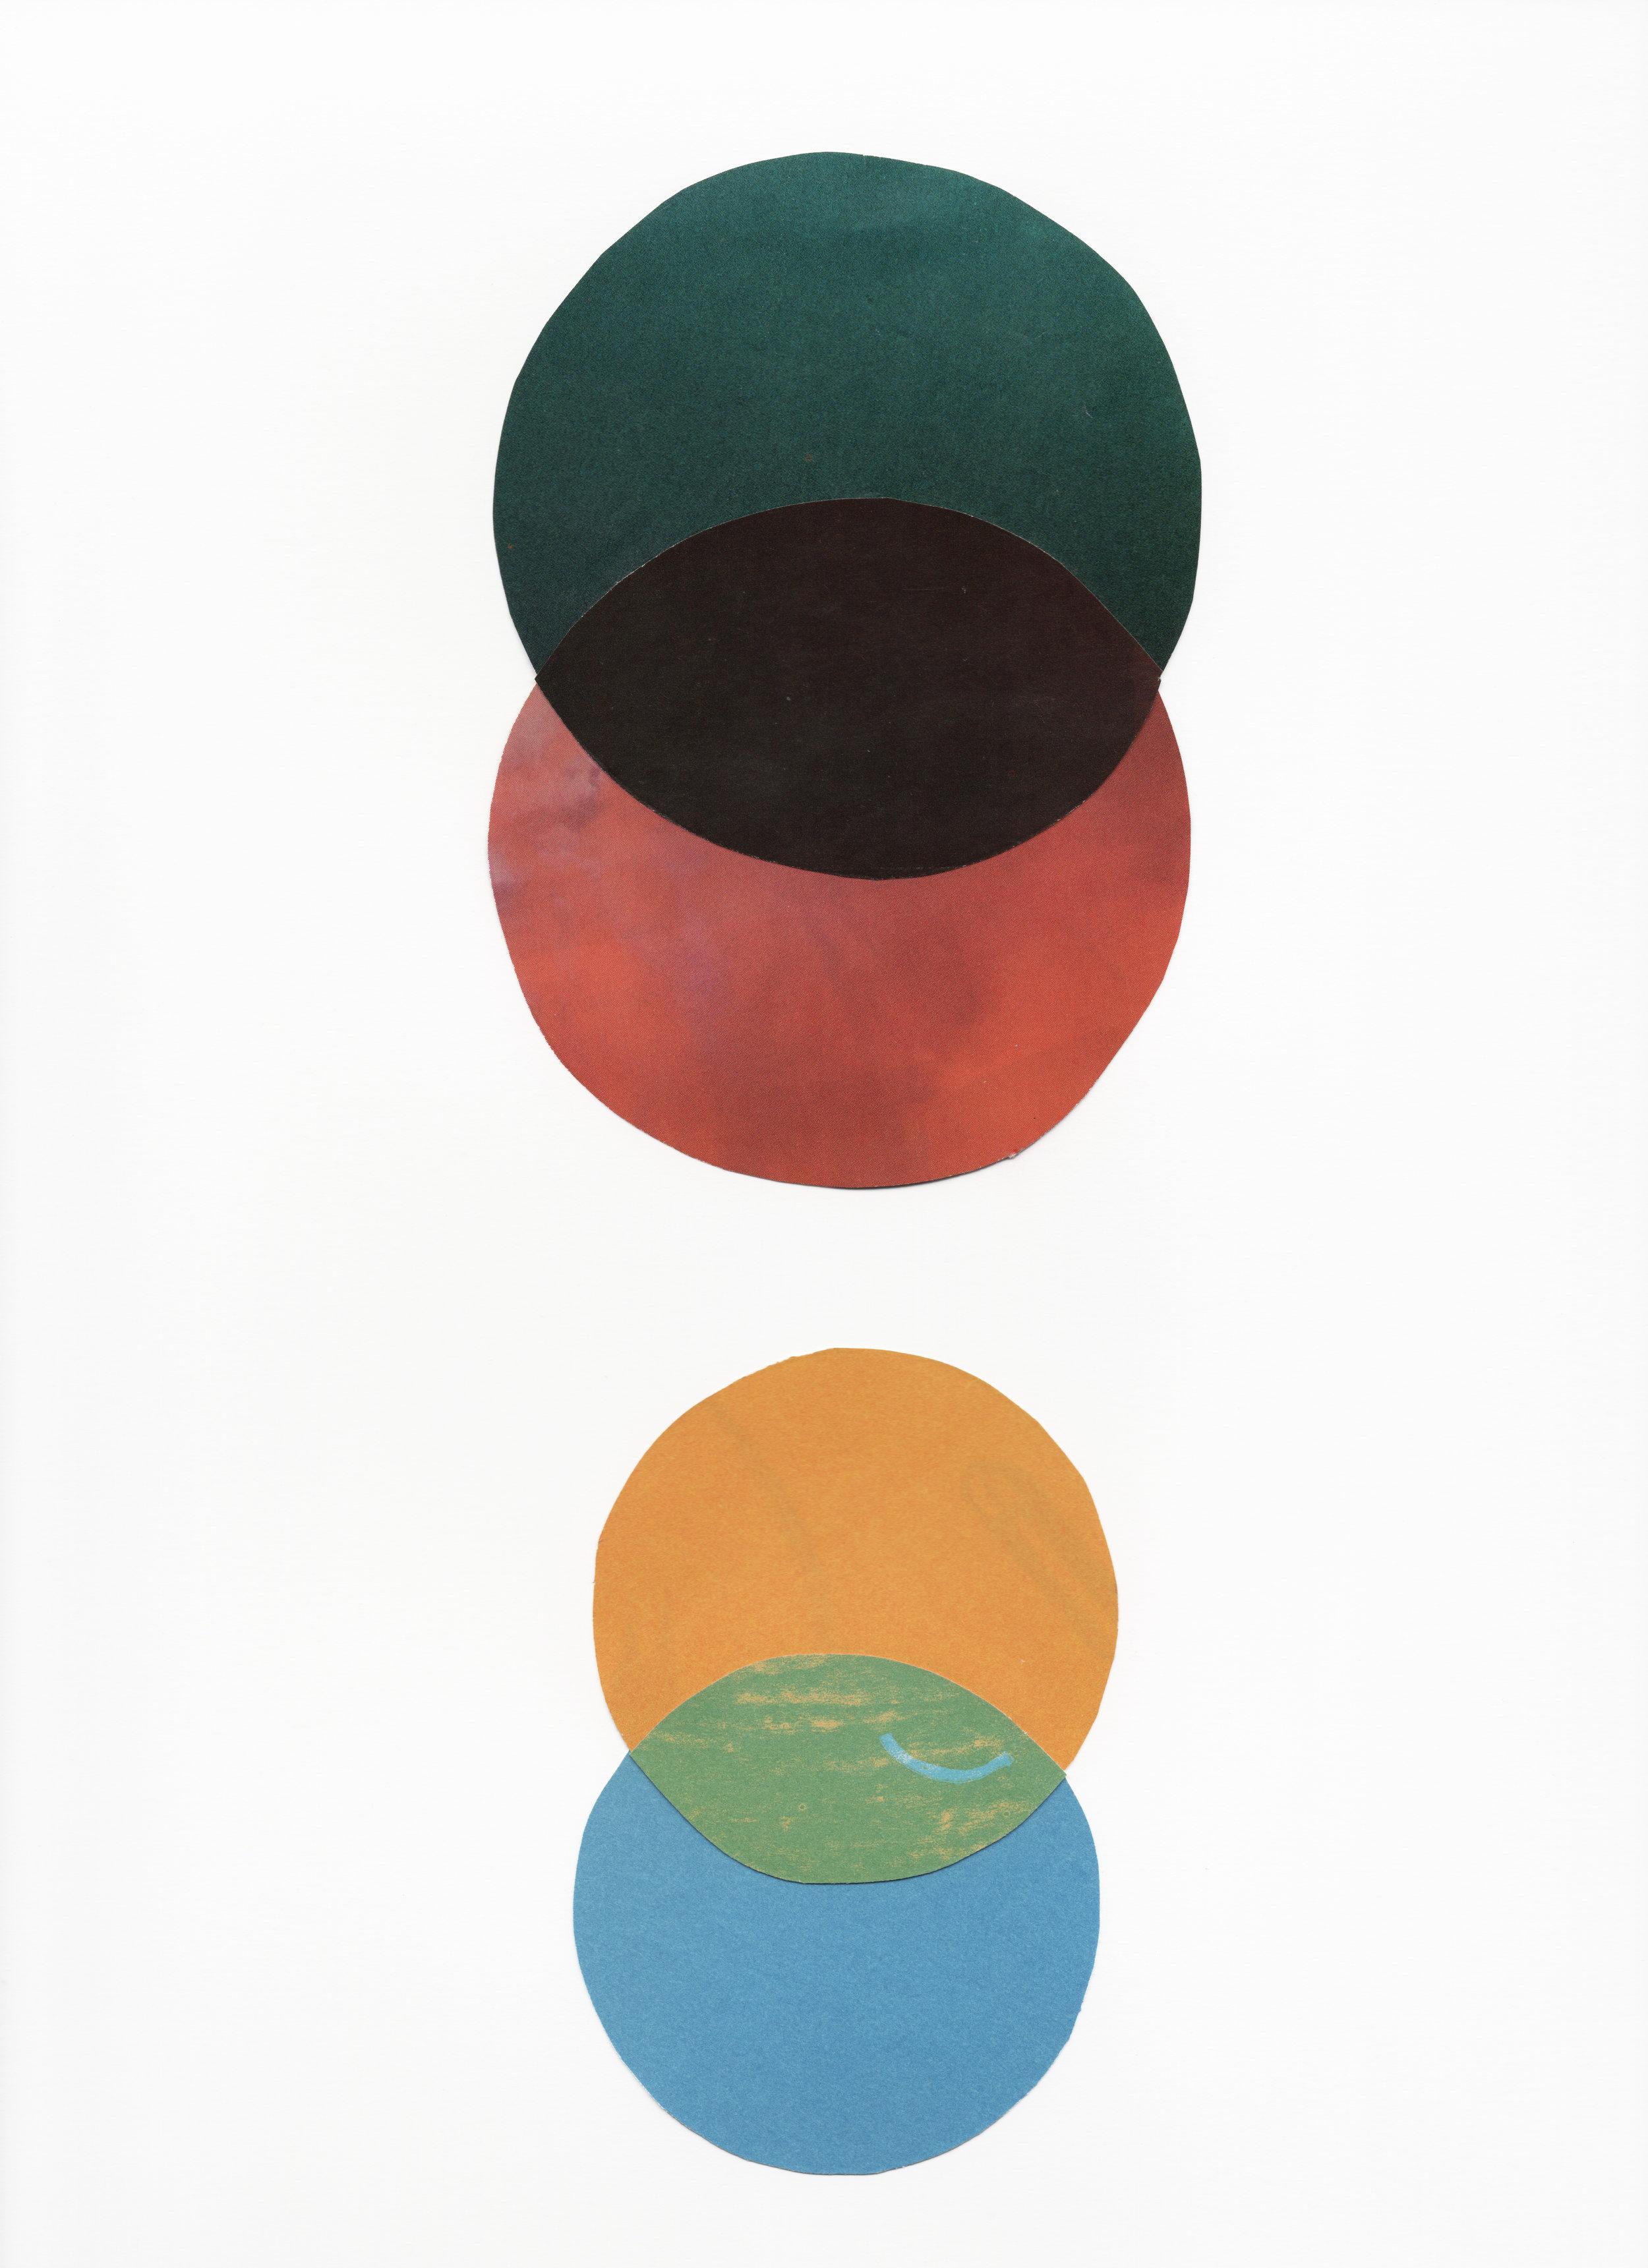 Color Study I   2017  Cut Paper on Bristol  9 x 12 inches